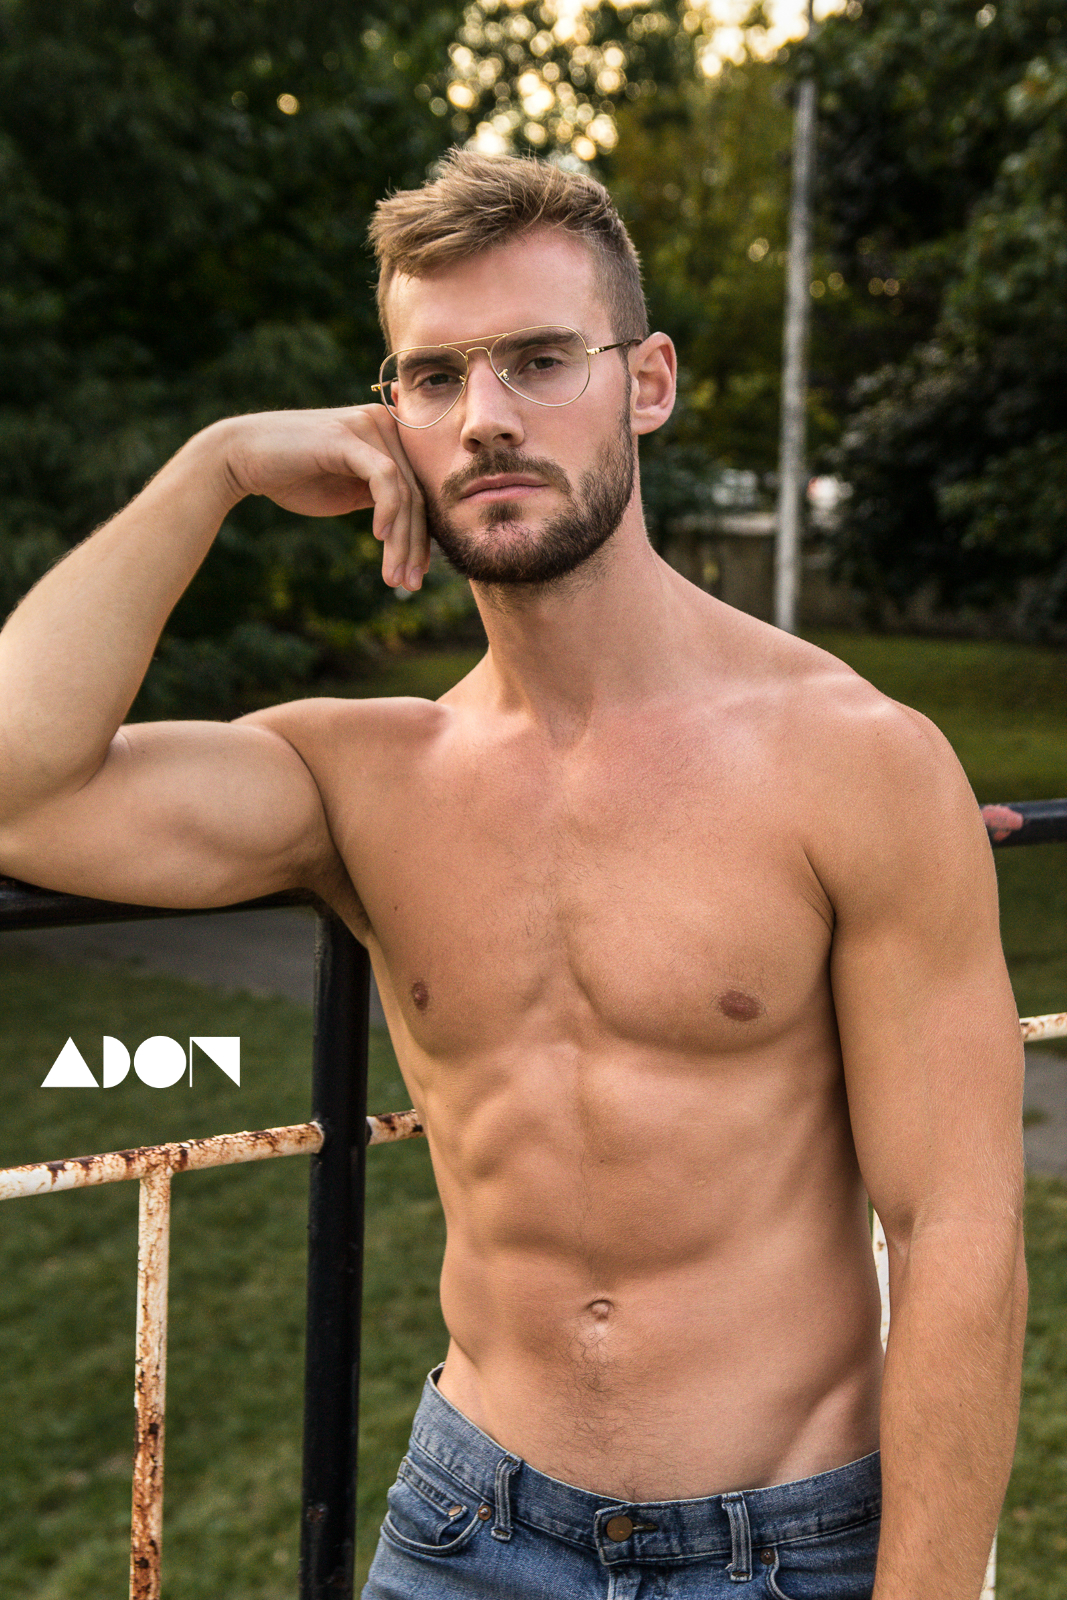 Adon Exclusive: Model Stephen Hodgson By Michael Porter